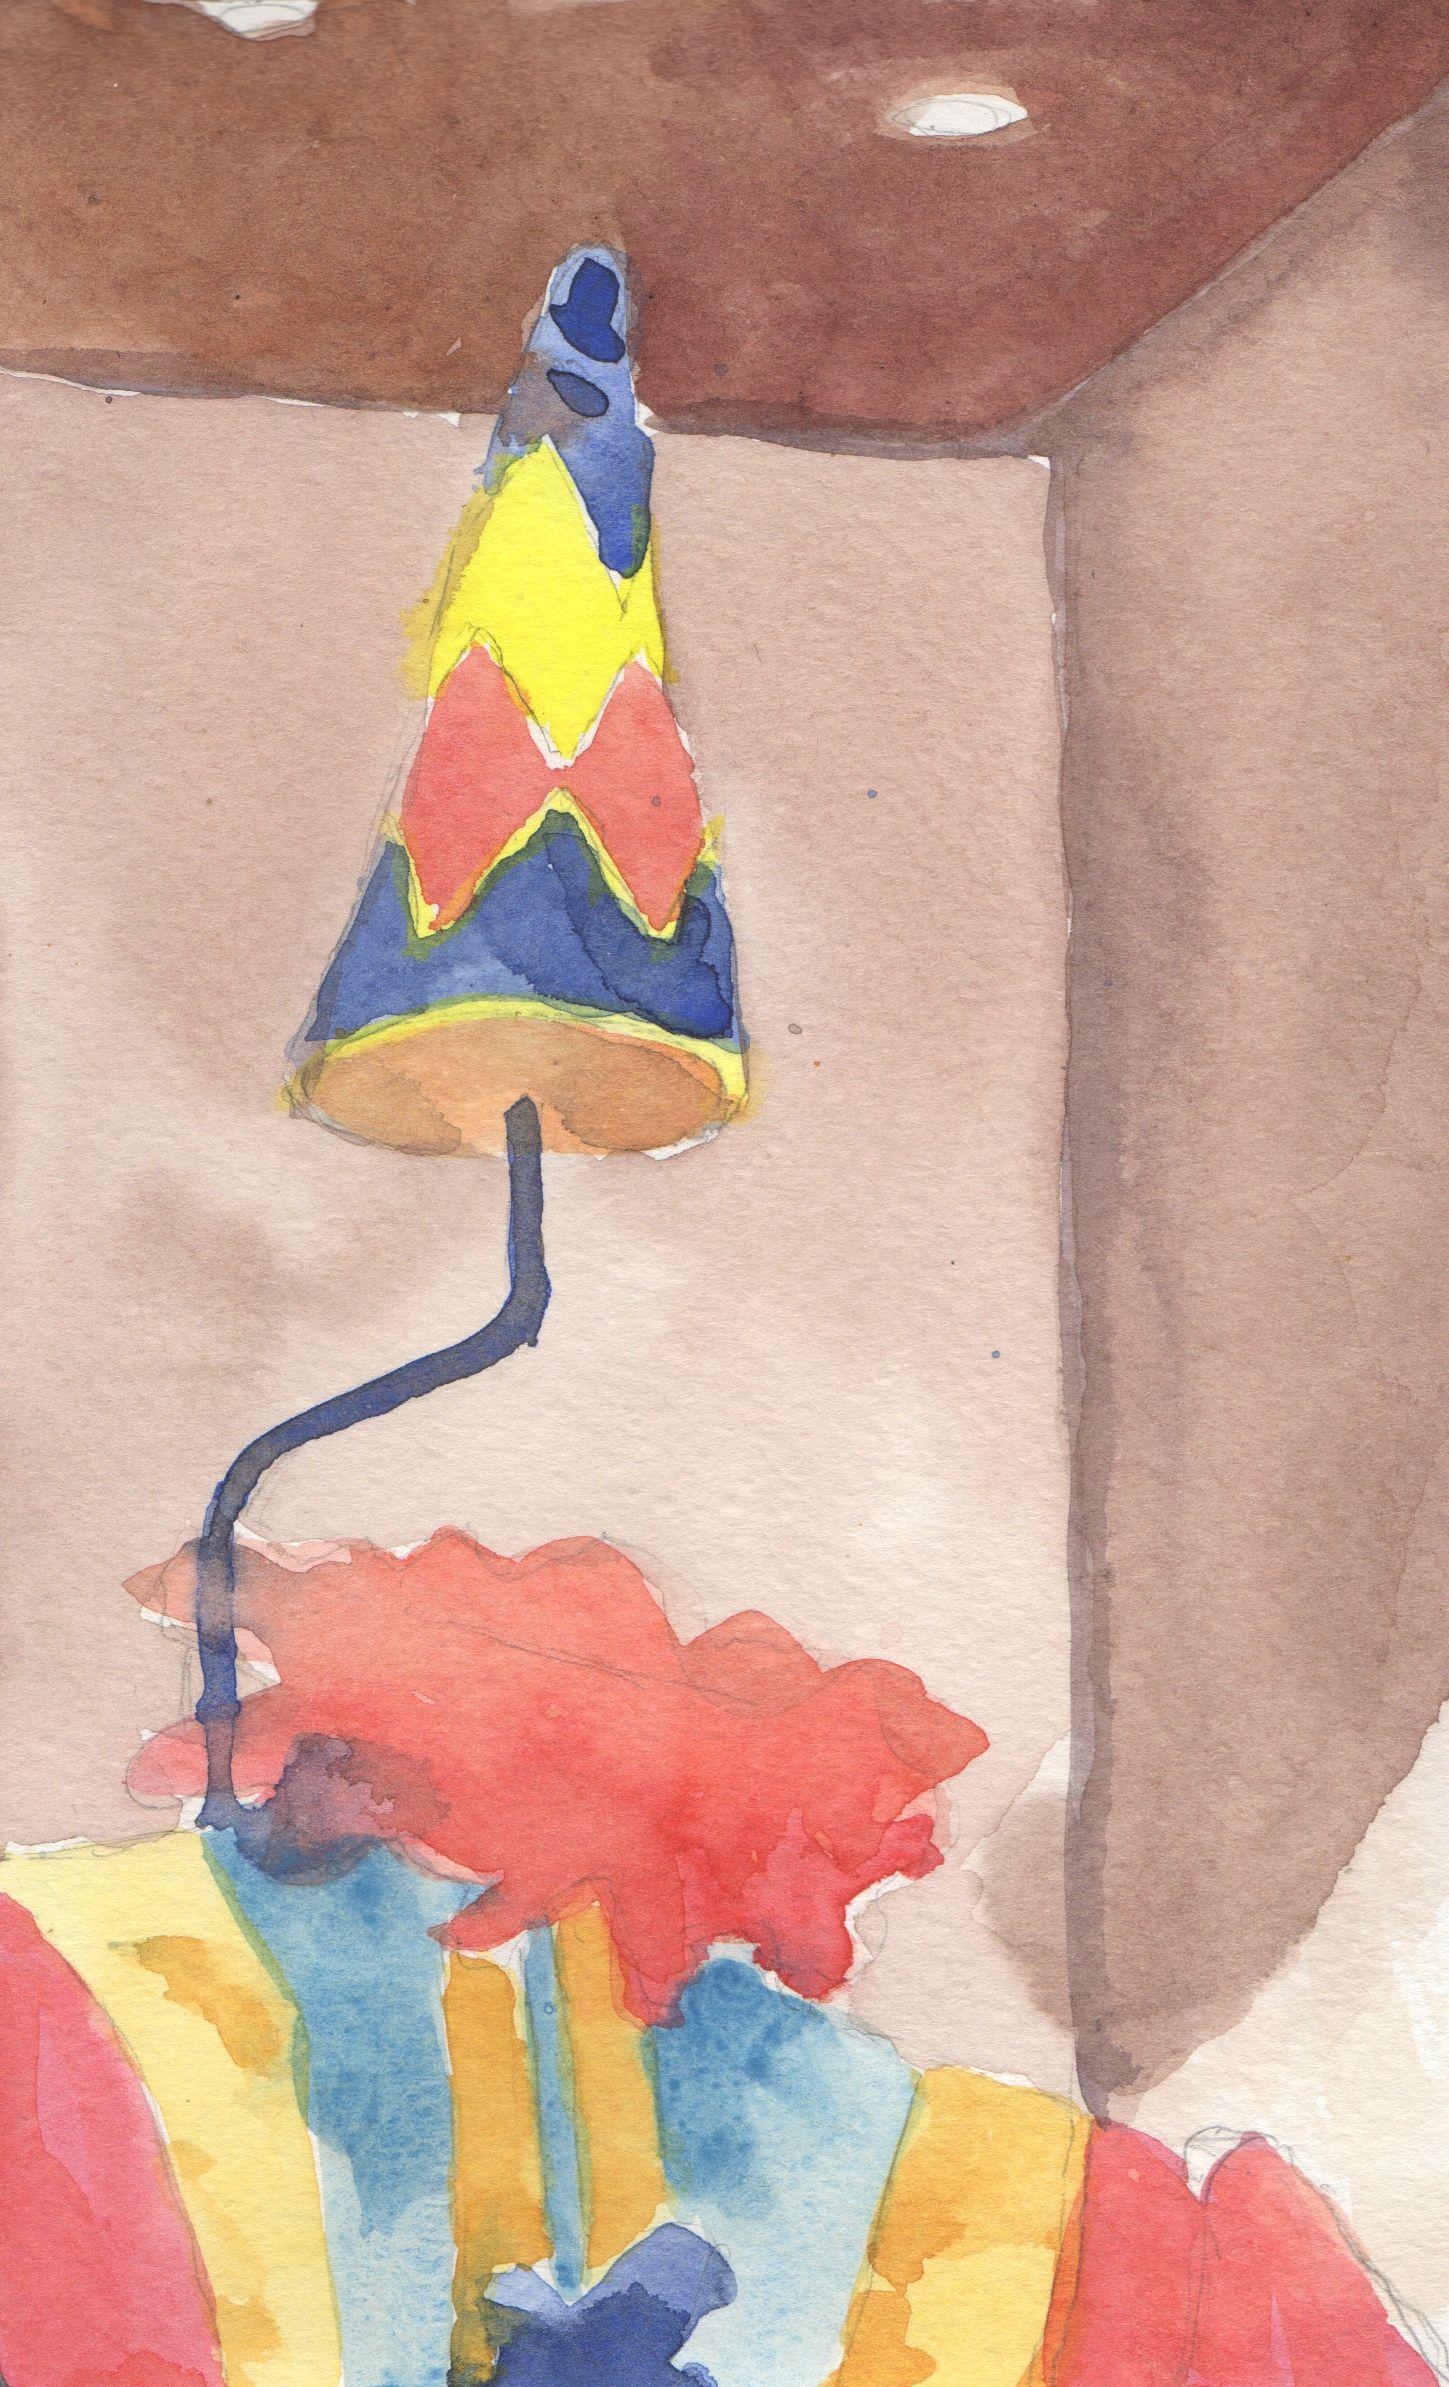 Costume of Wunda Wunda, Seattle children's television personality, MOHAI, Seattle